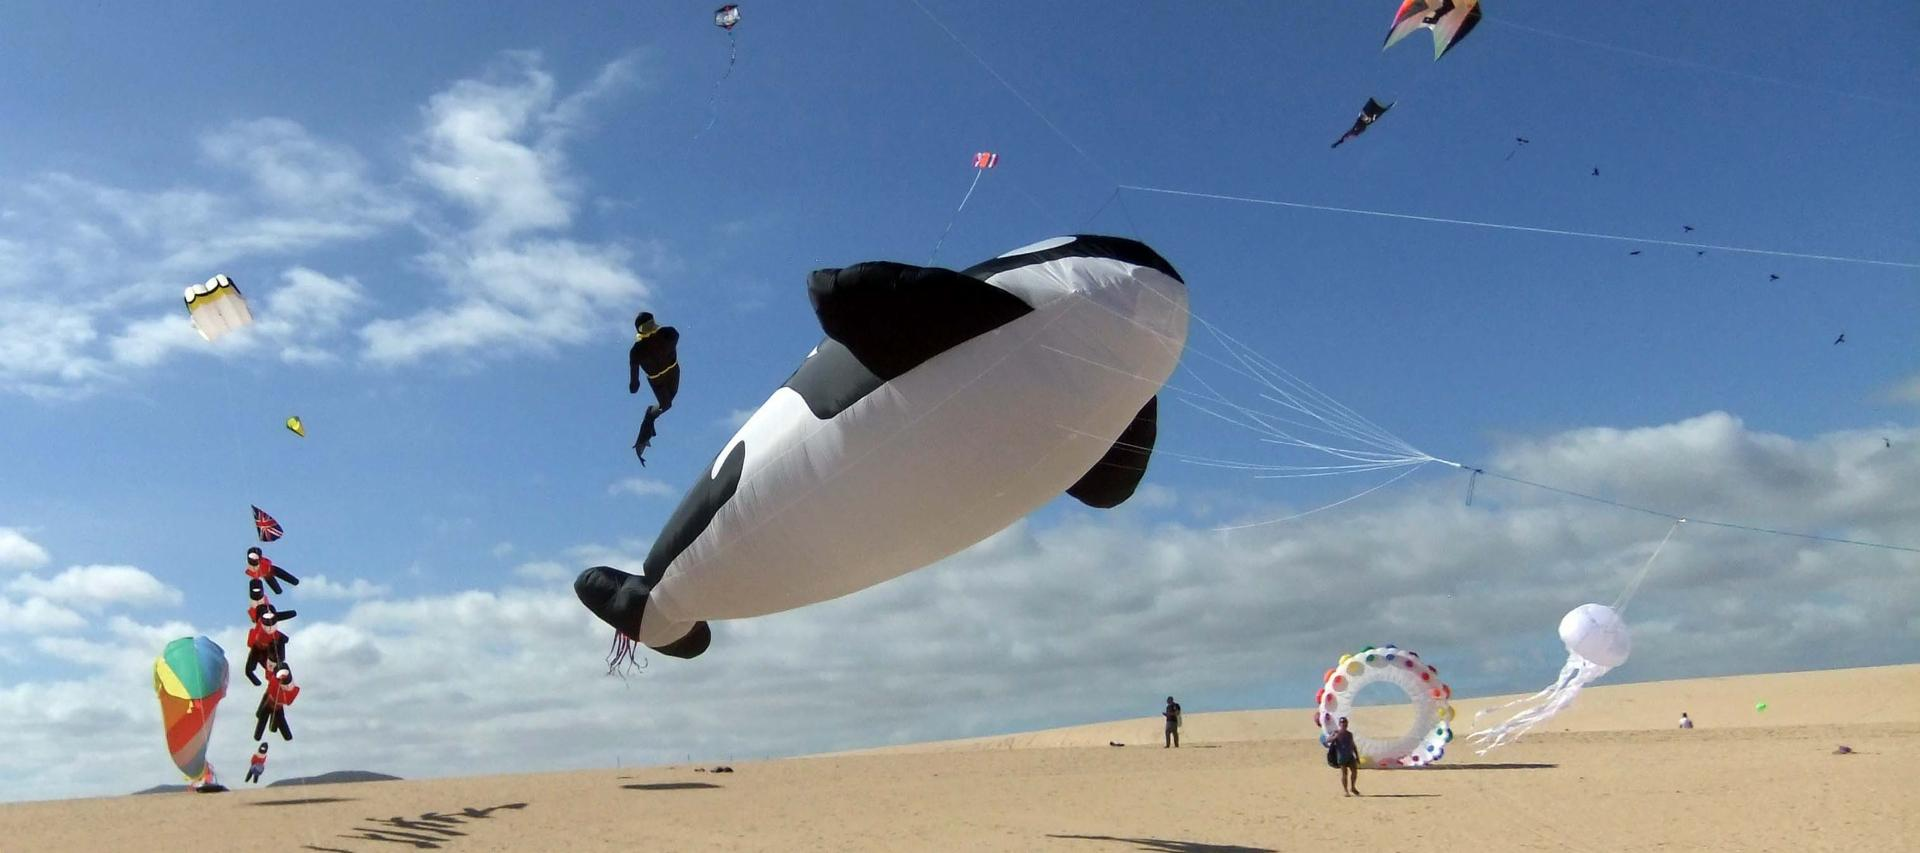 Fuerteventura Kite Festival | Your Guide to Fuerteventura